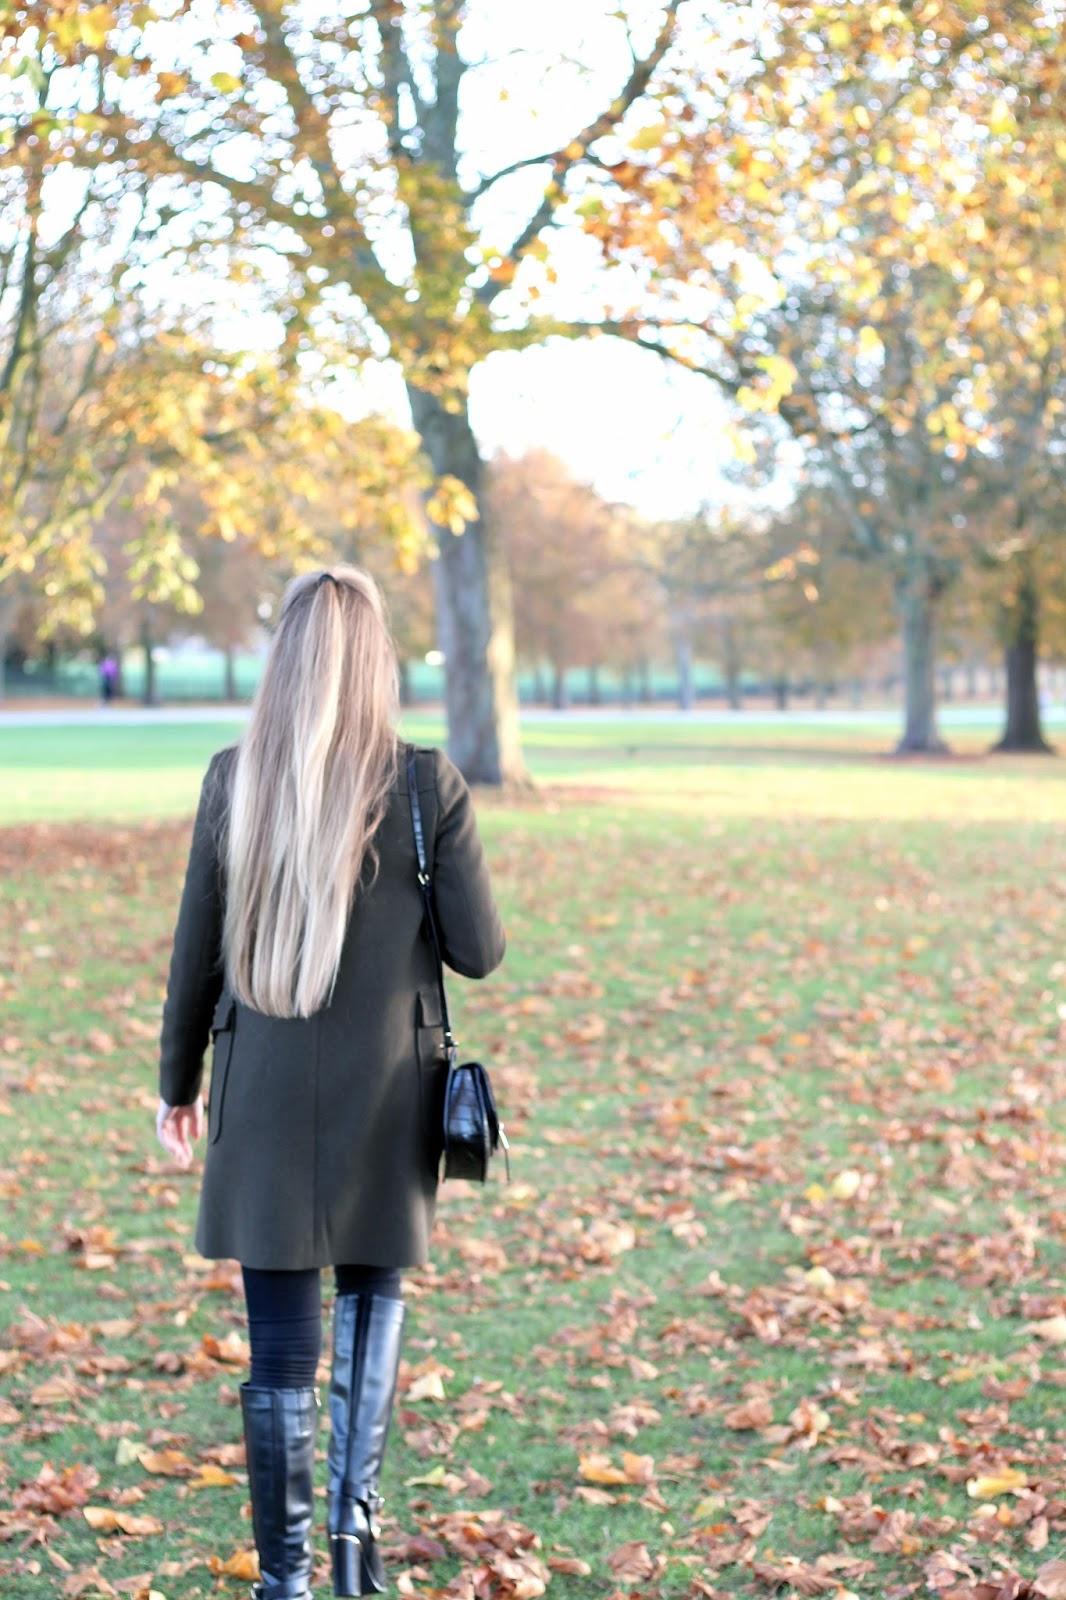 Long blonde hair Autumnal scene orange leaves